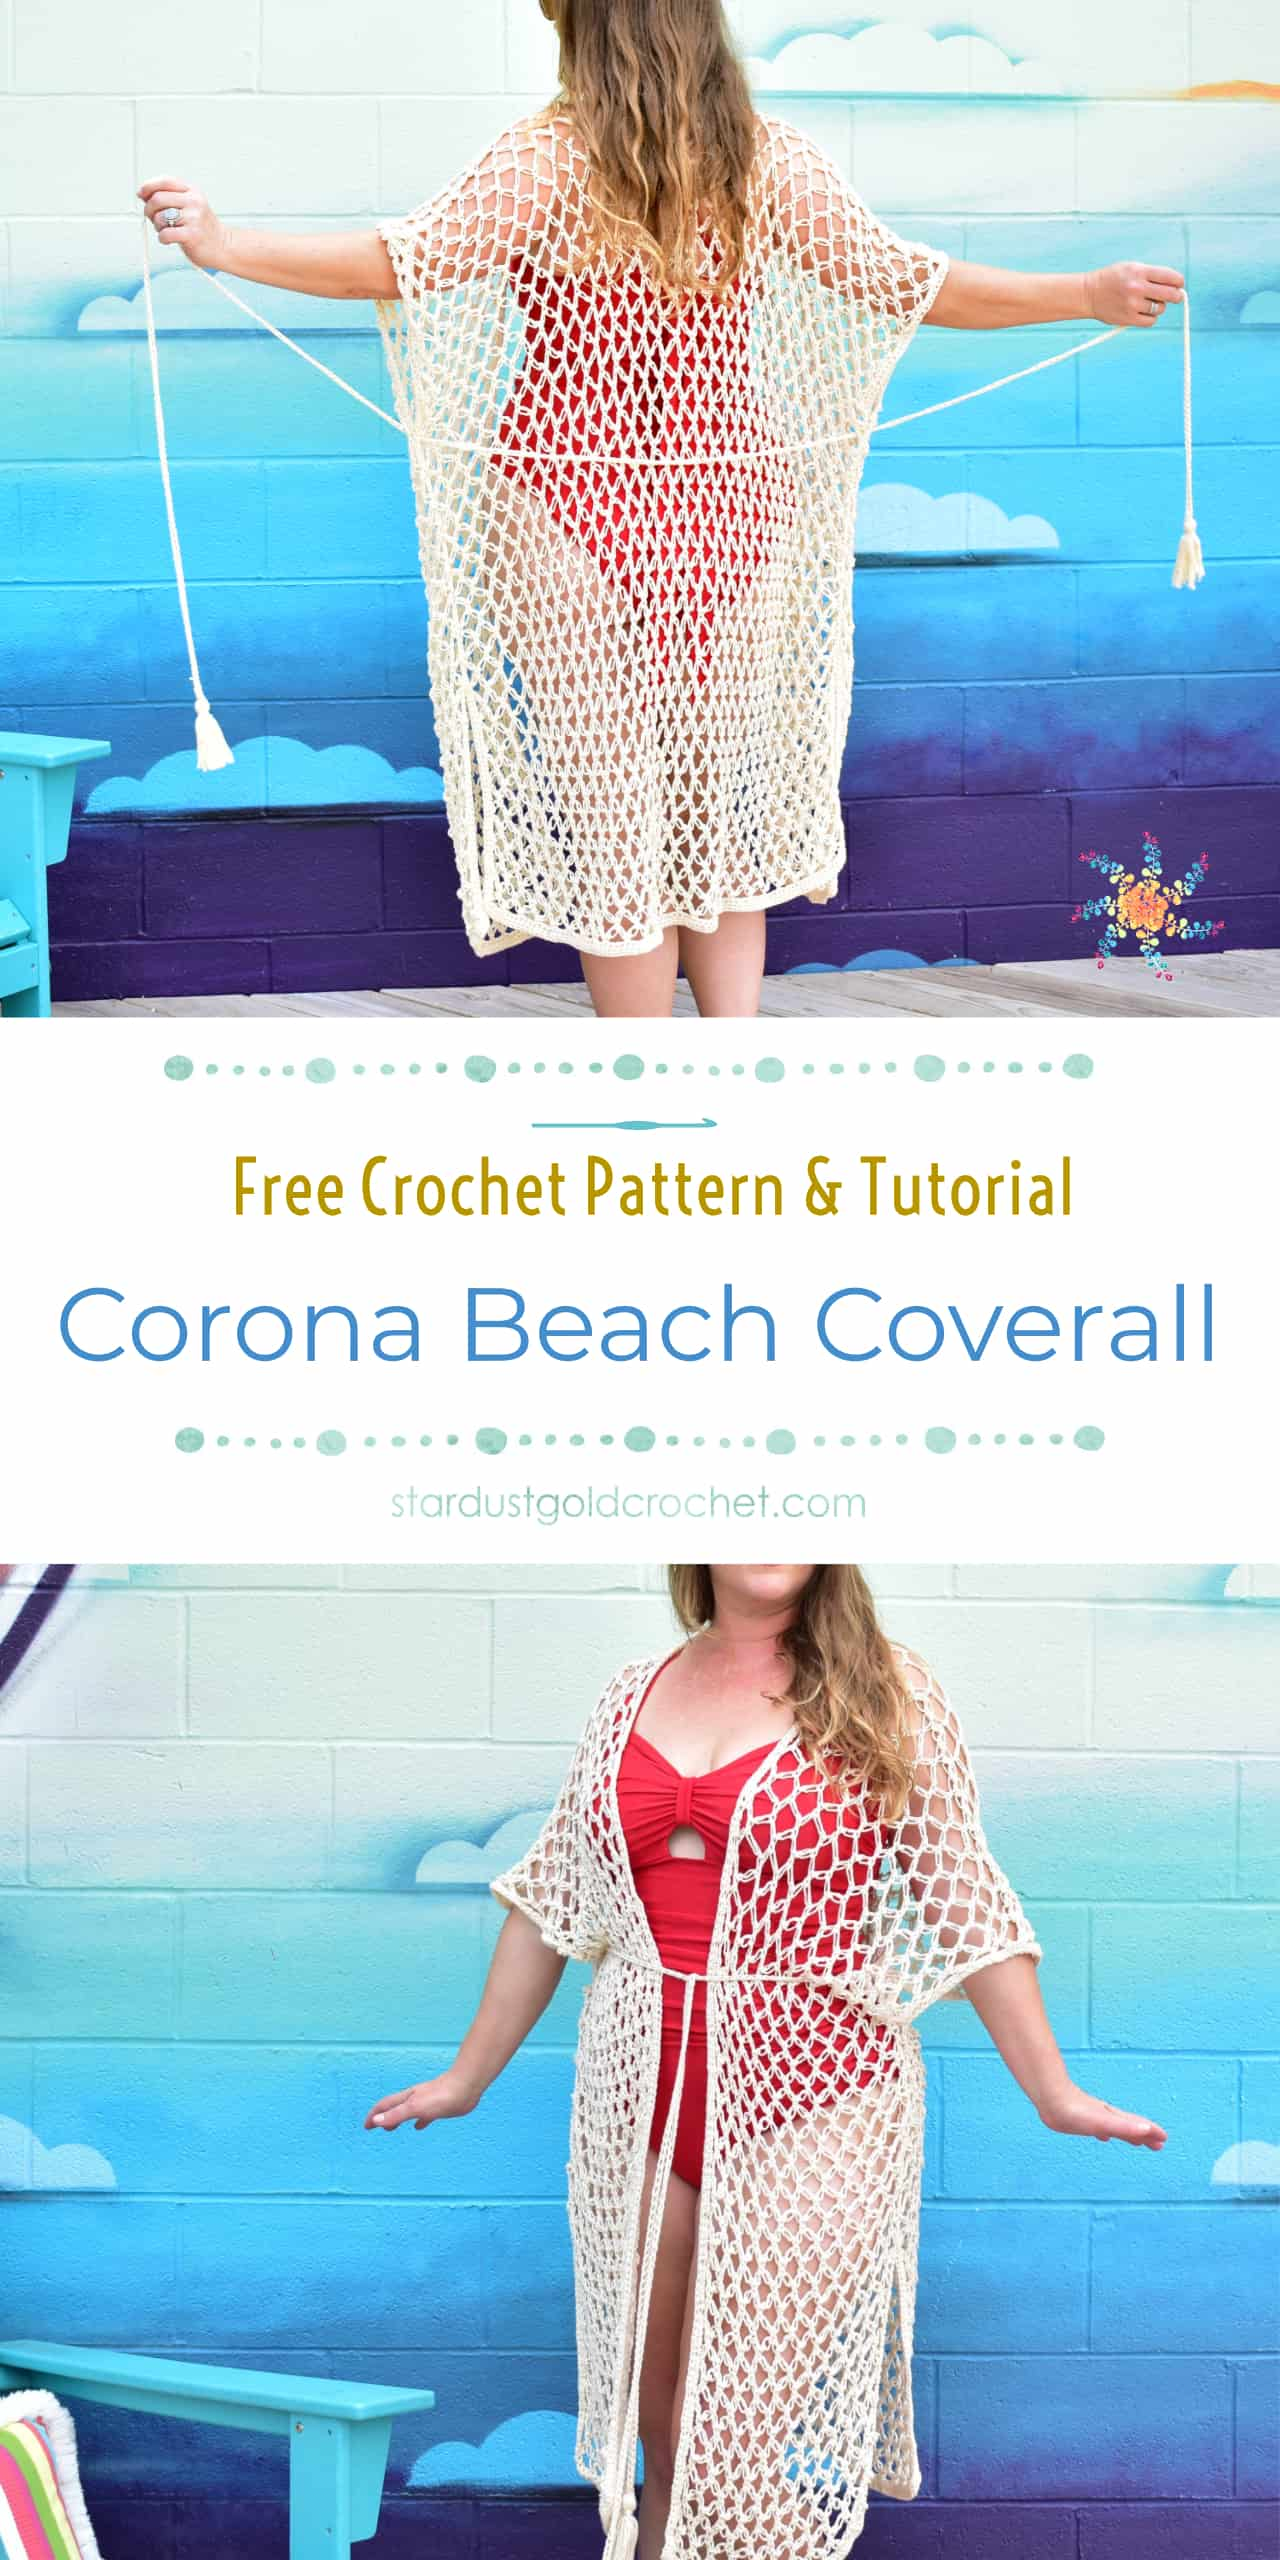 Corona Beach Coverall